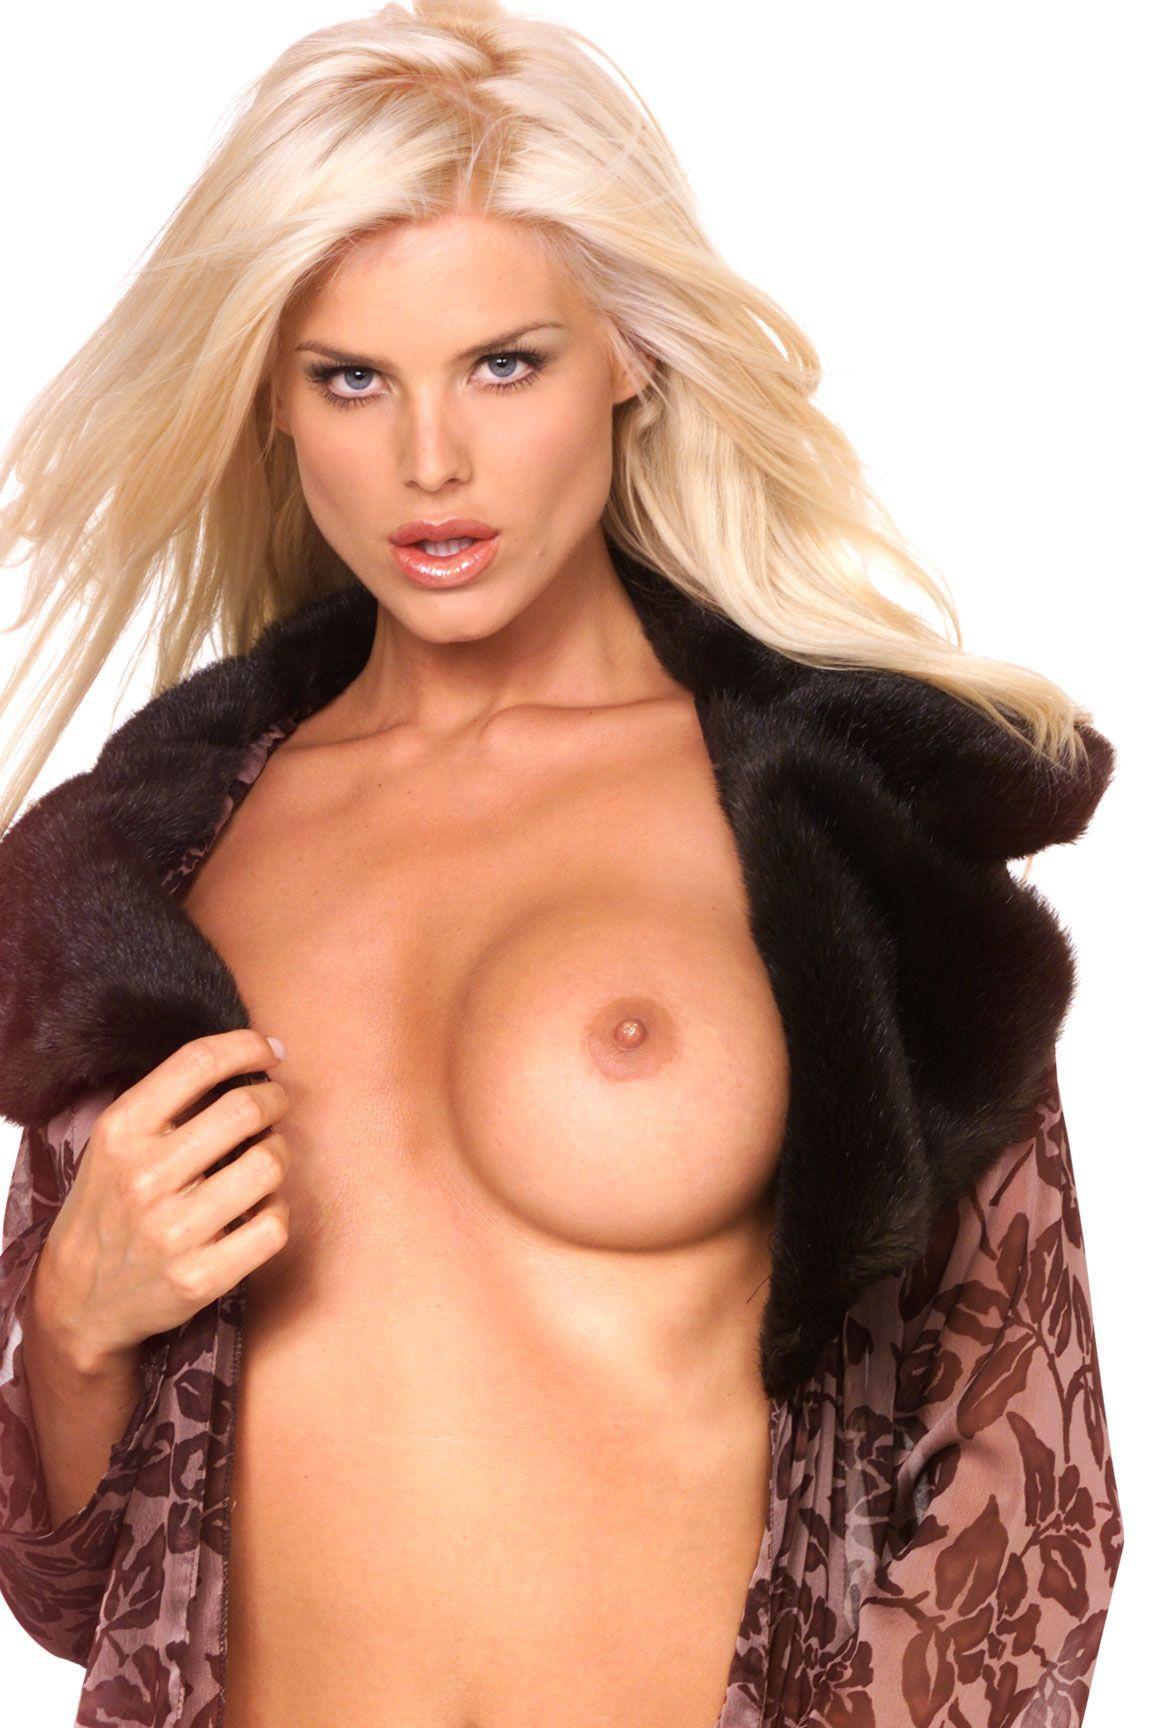 silvstedt-naken-fuck-women-nudes